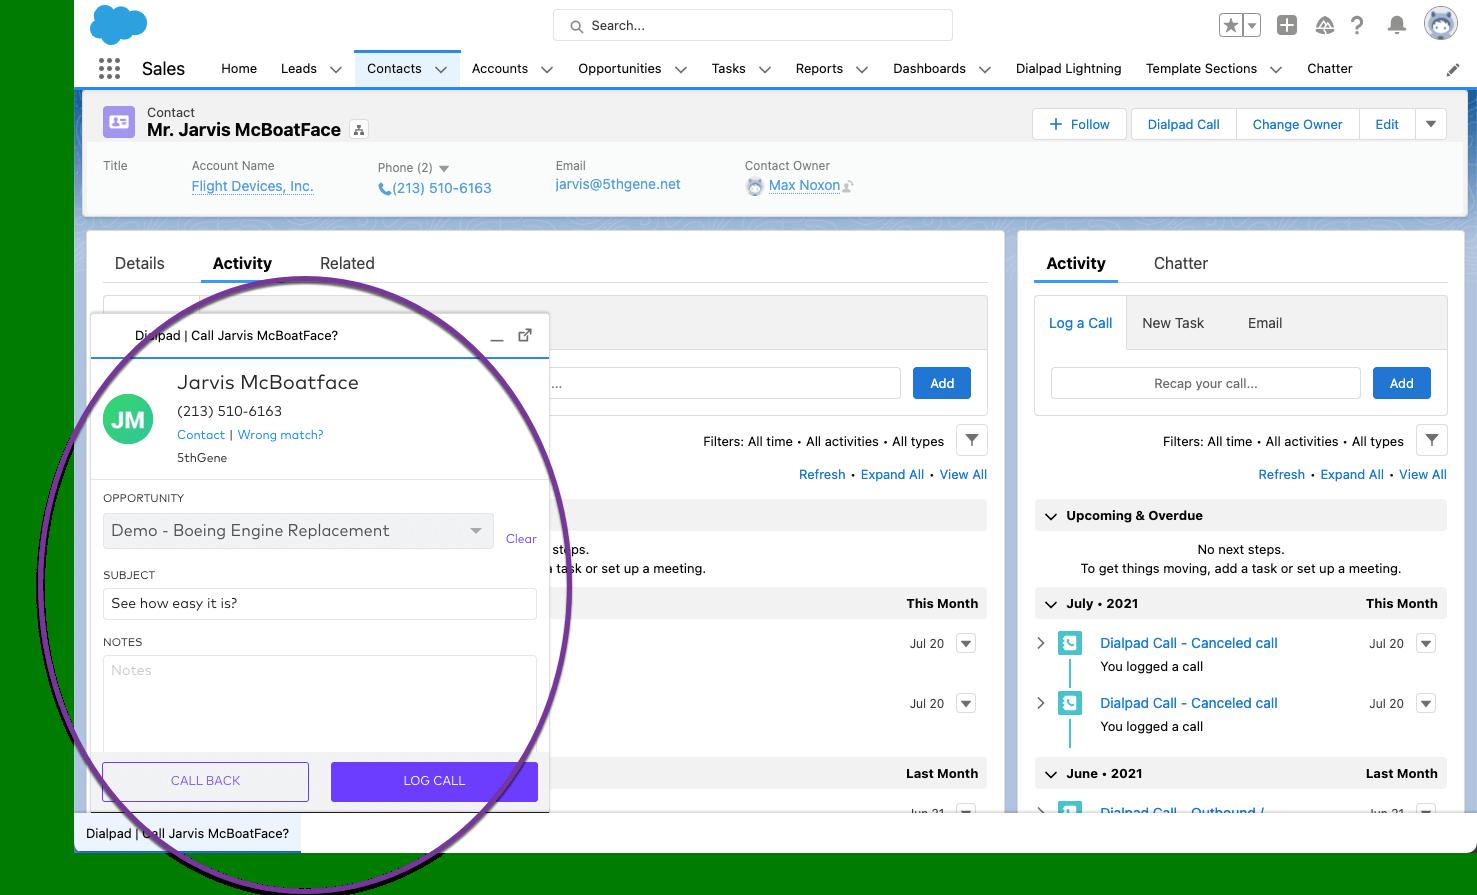 Salesforce dialpad cti maxs example